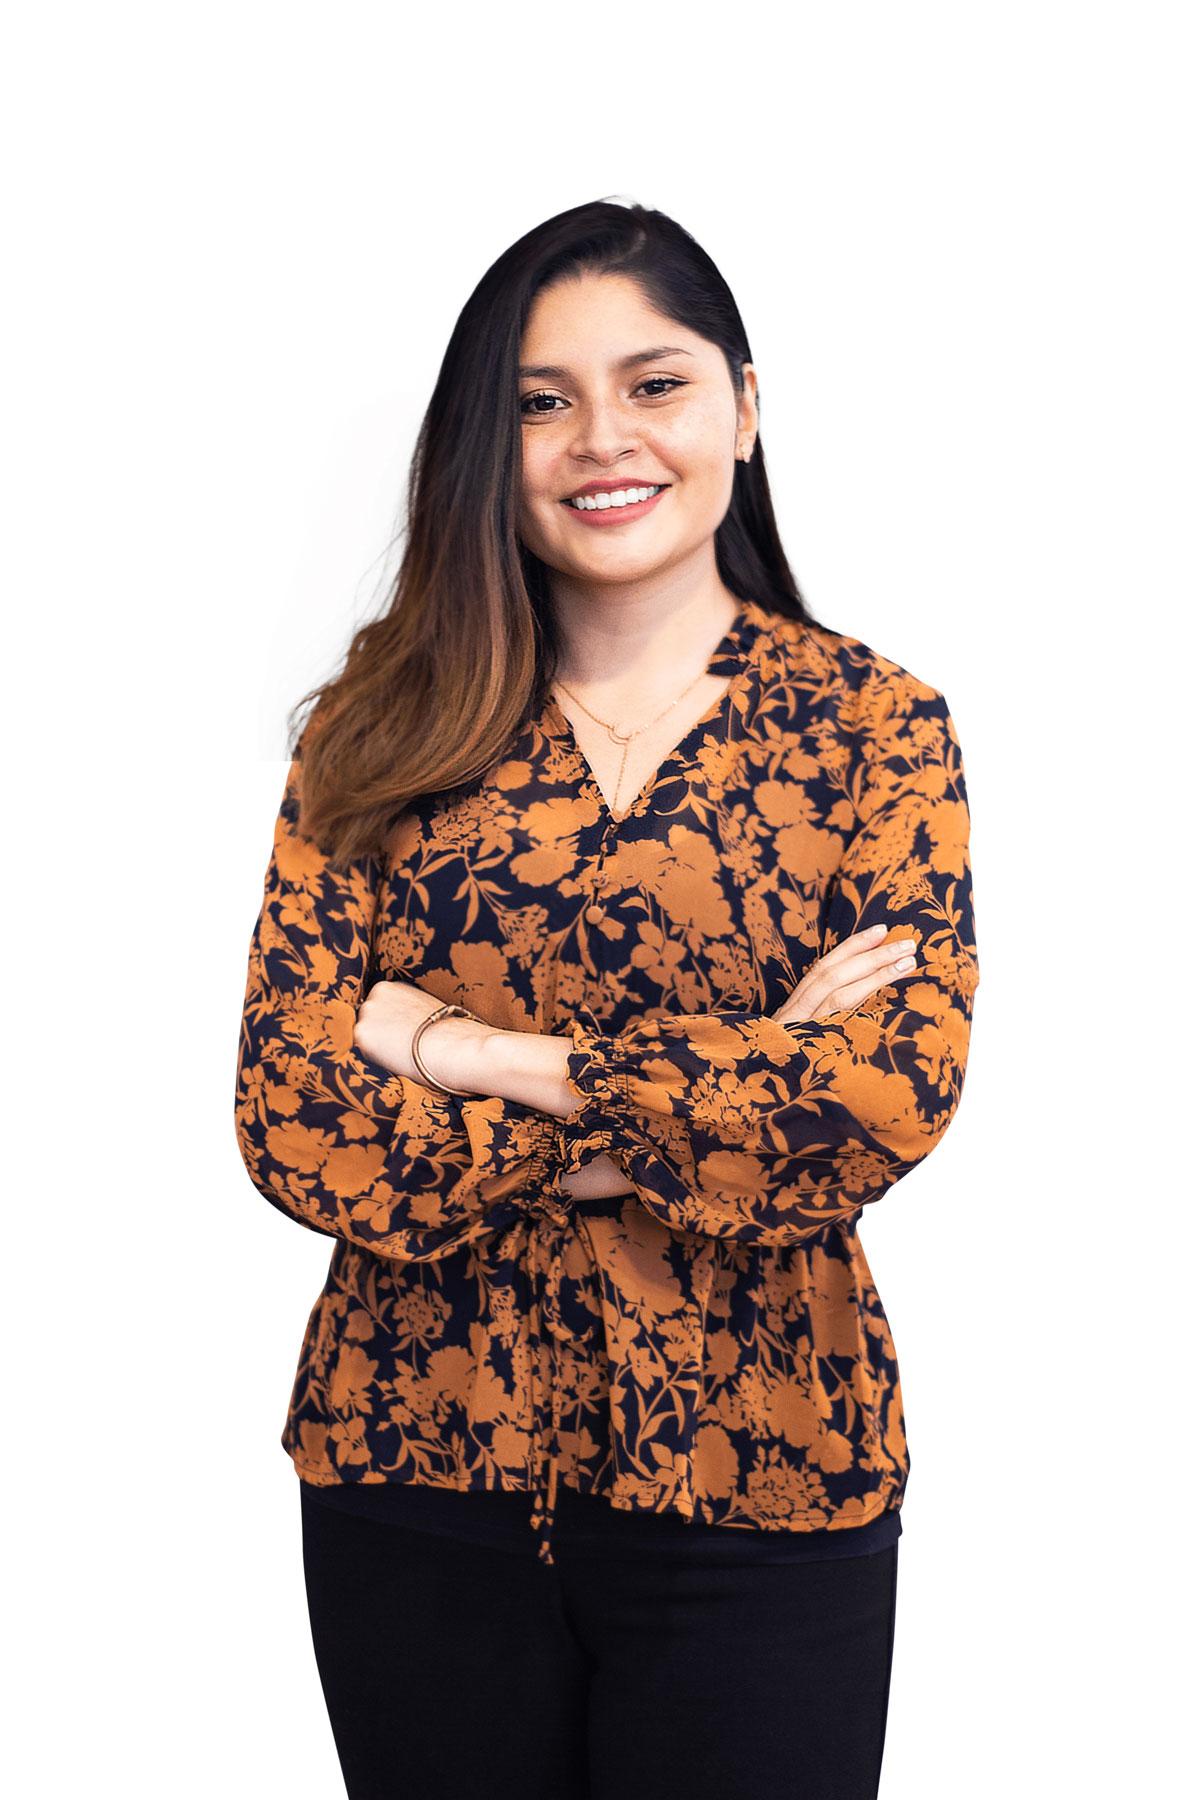 Ana Villagomez